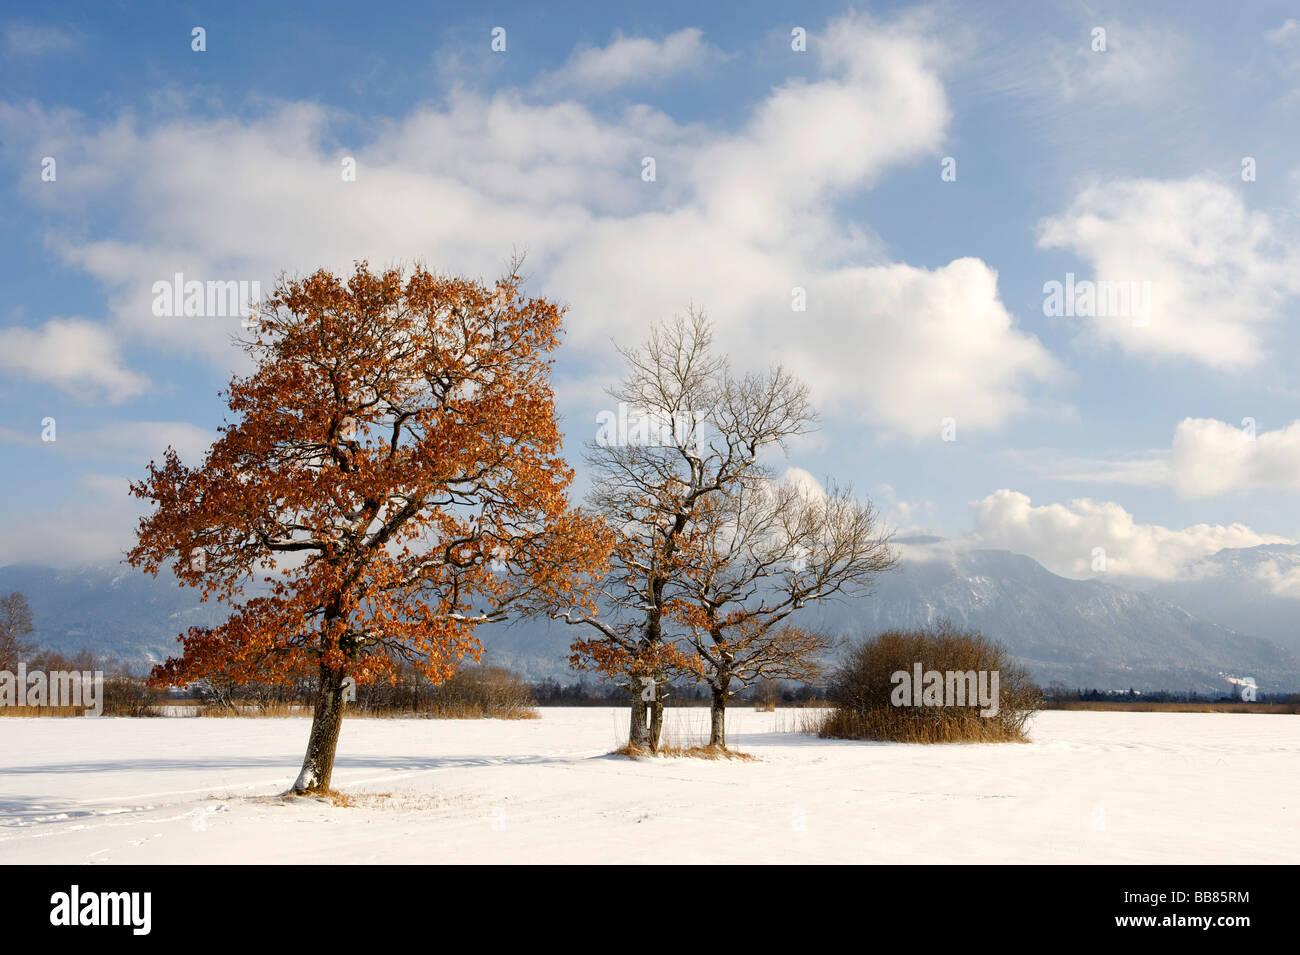 Murnauer Moos, Murnau marsh, Upper Bavaria, Germany, Europe - Stock Image